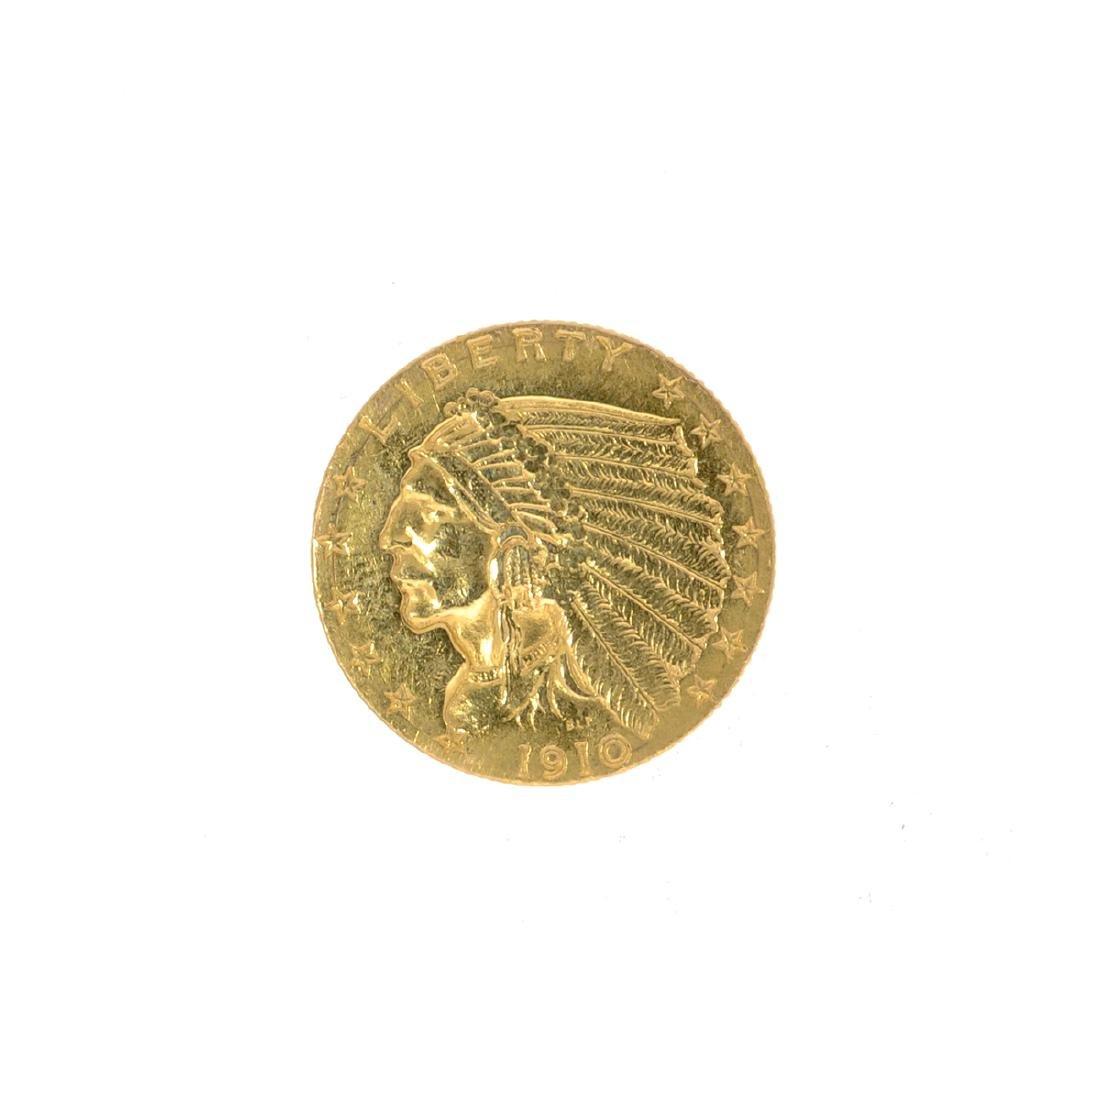 *1910 $2.50 U.S. Indian Head Gold Coin (JG N)